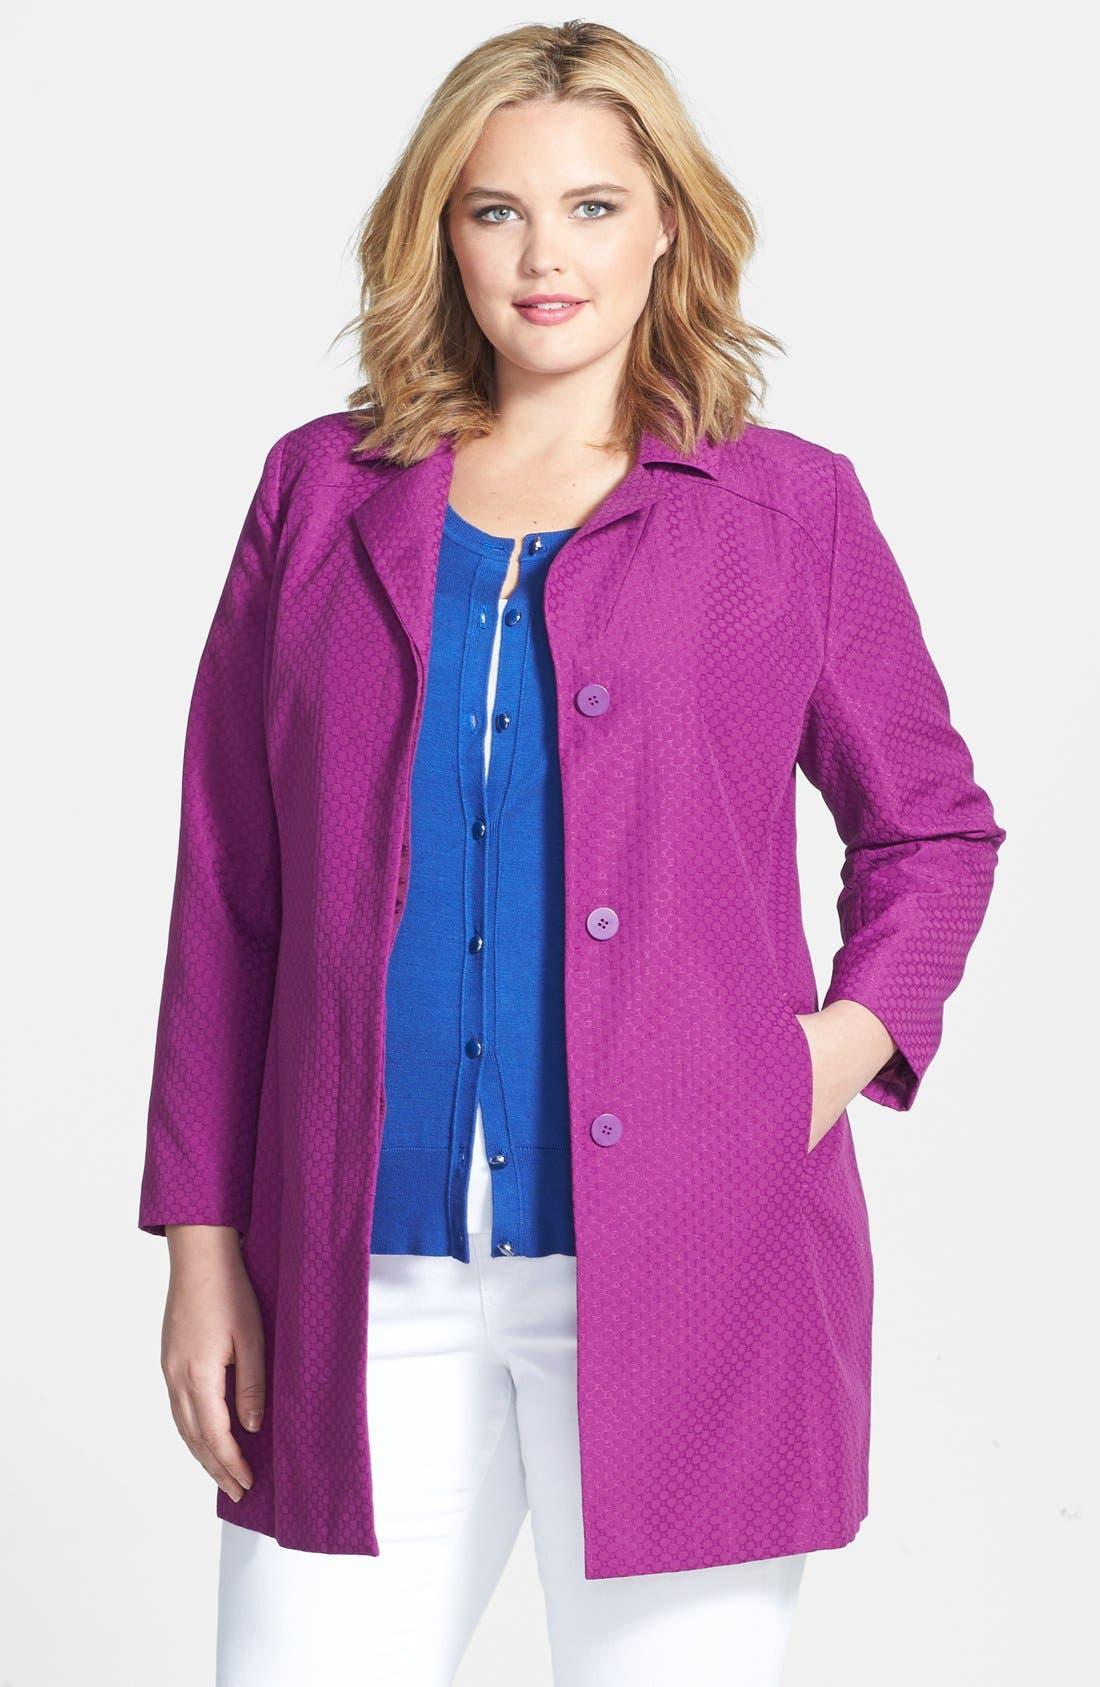 Alternate Image 1 Selected - Sejour Jacquard Topper Jacket (Plus Size)